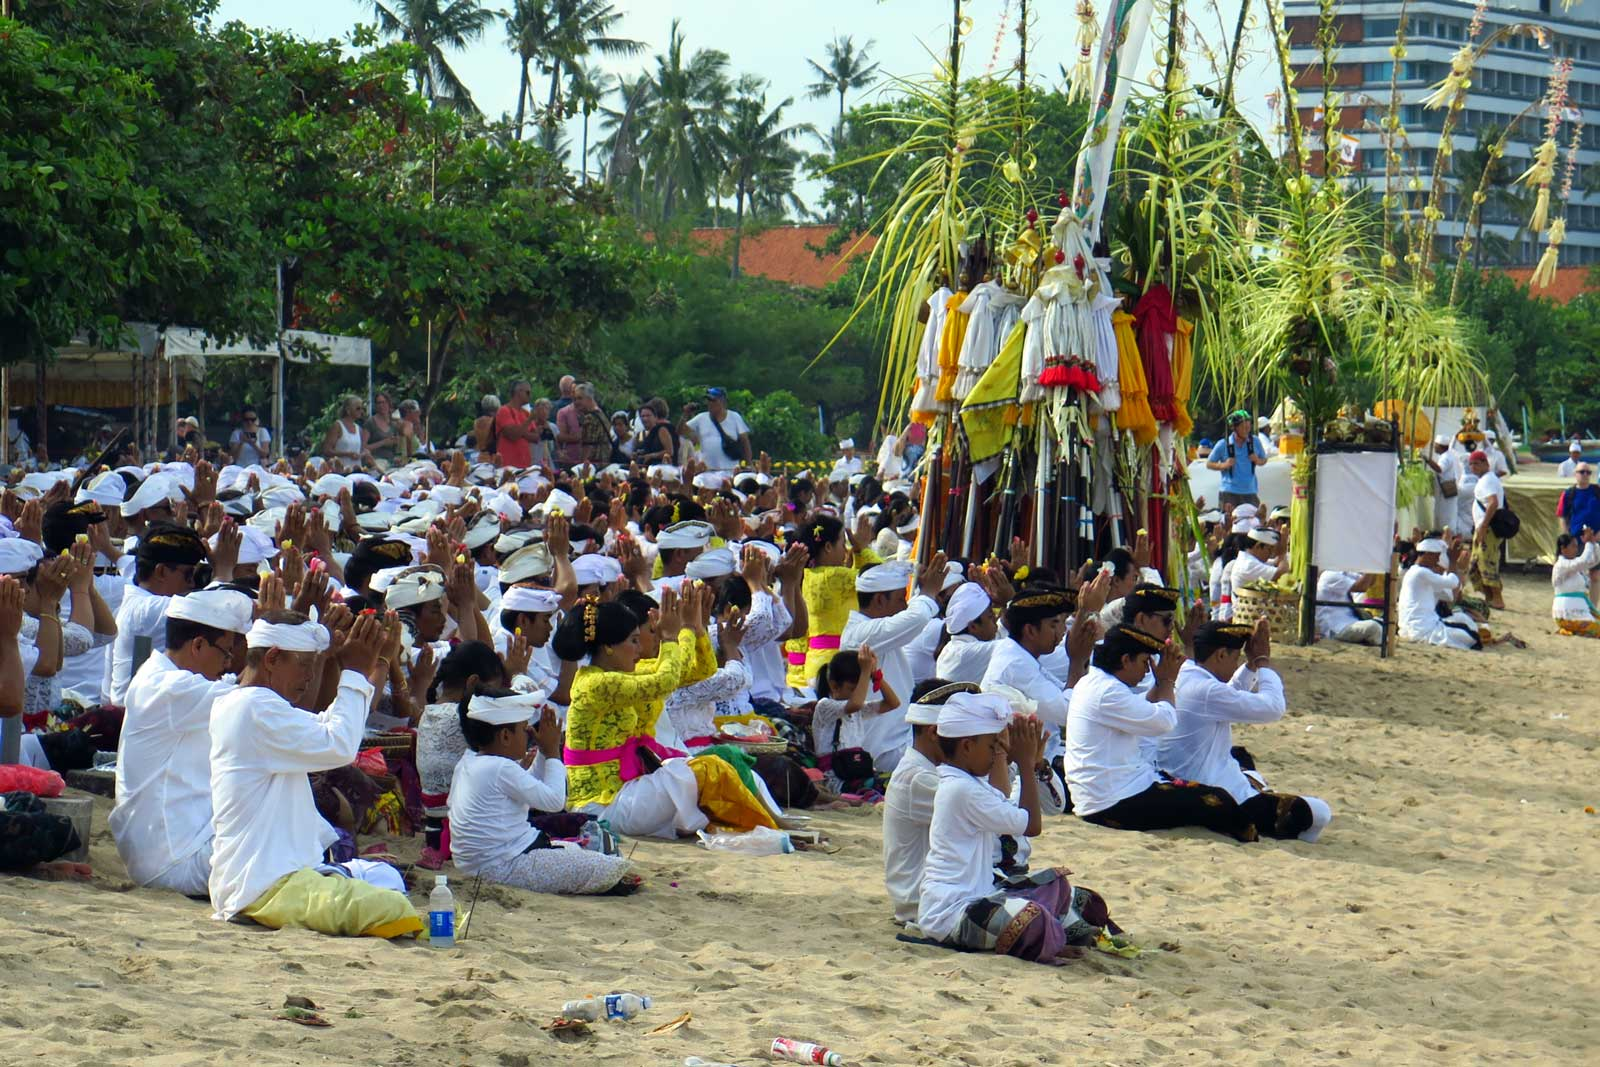 Melasti tseremoonia Bali rannal